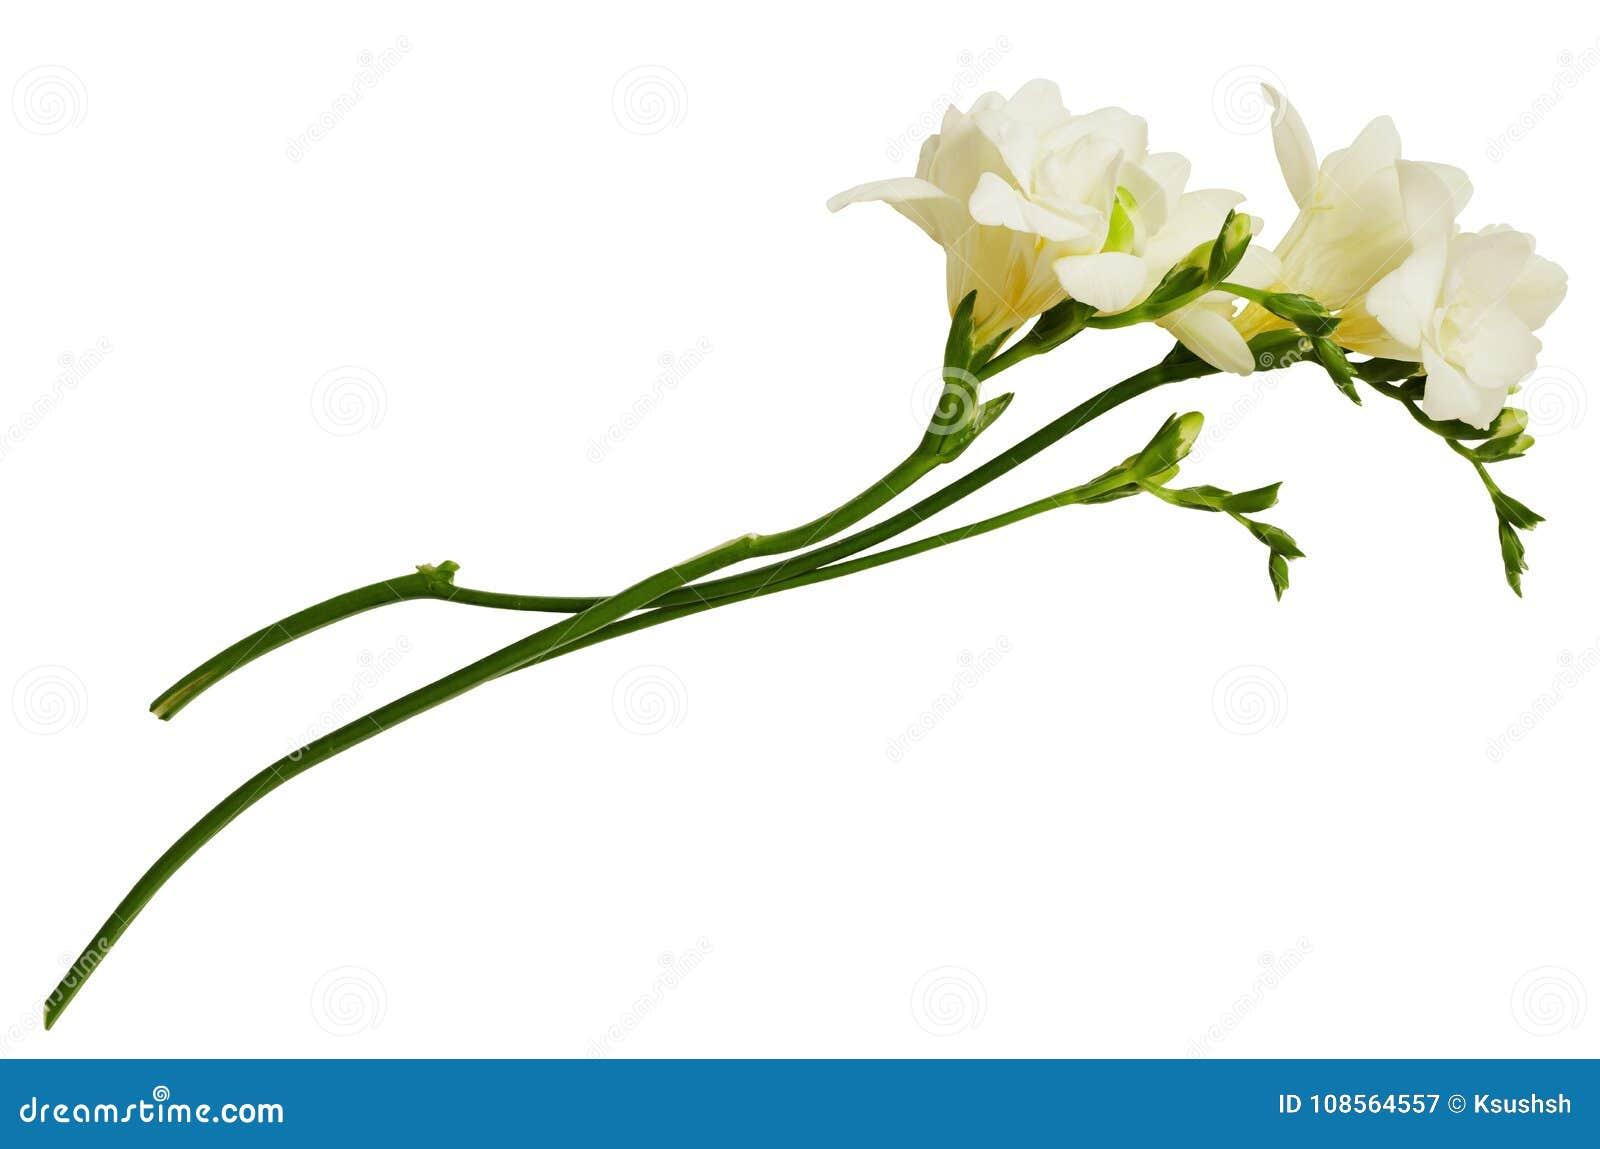 White freesia flowers stock image image of fresh twig 108564557 white freesia flowers mightylinksfo